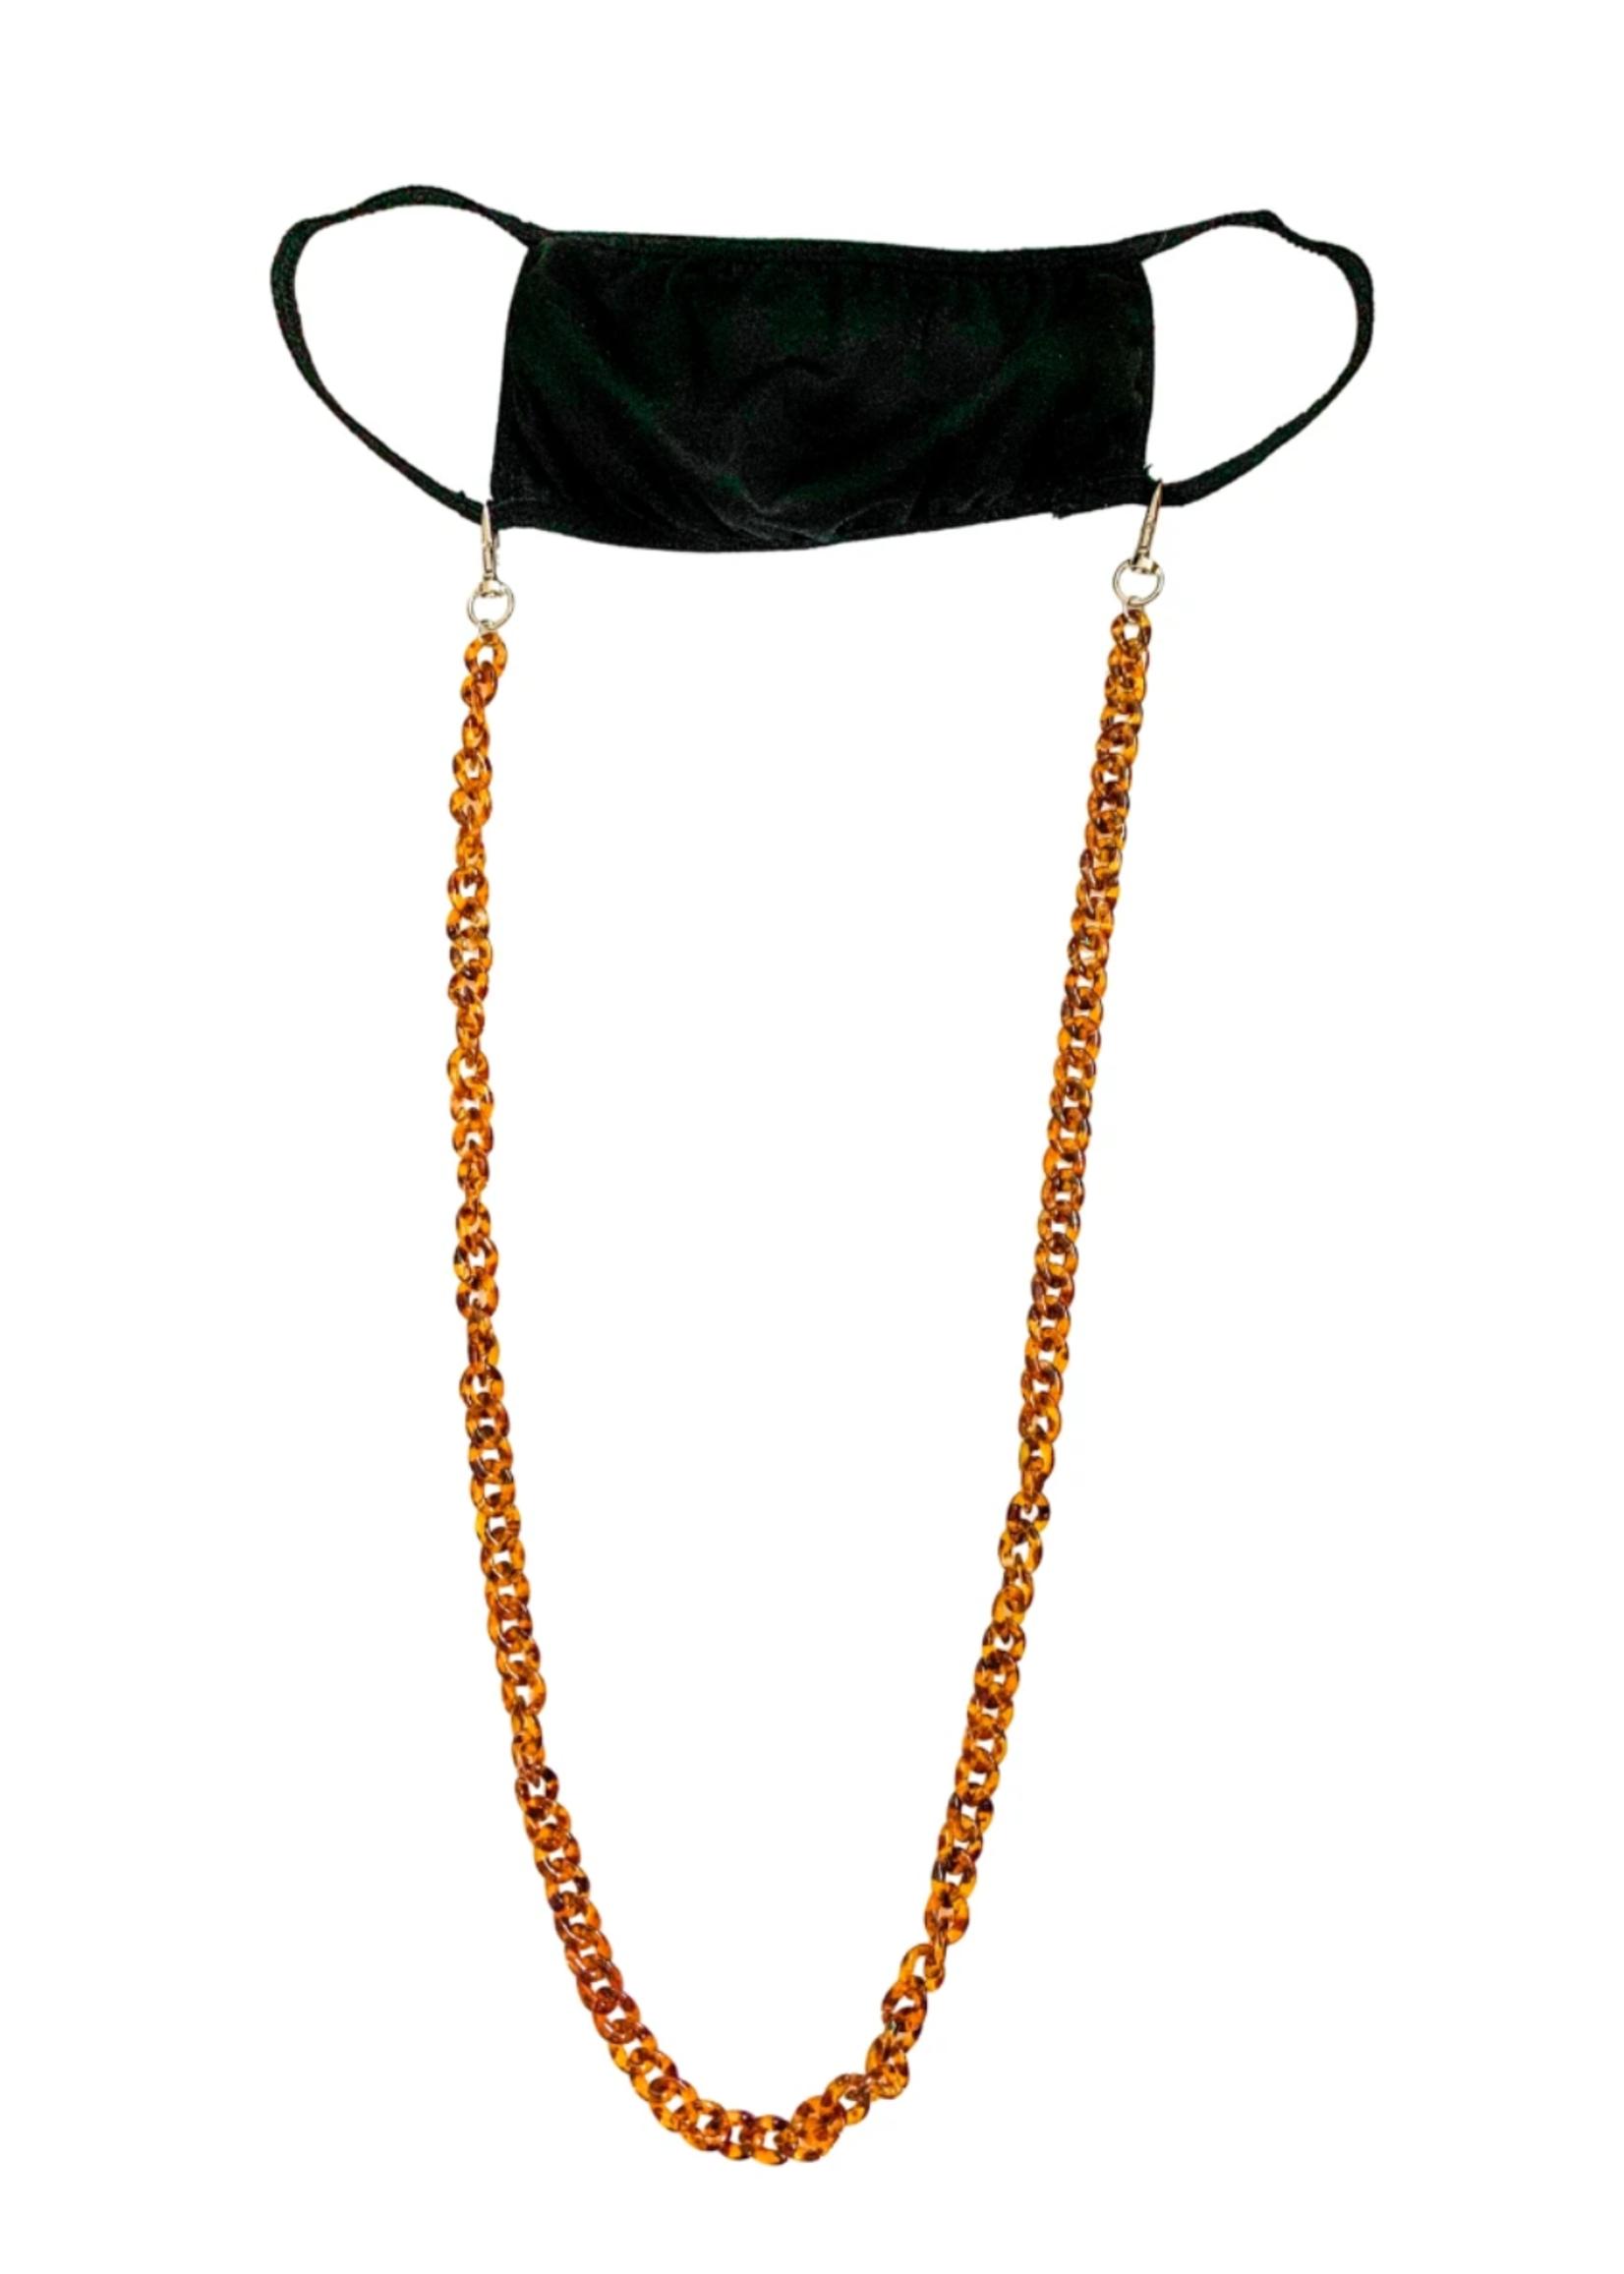 Slone Designs Dainty Tortoise Mask Chain